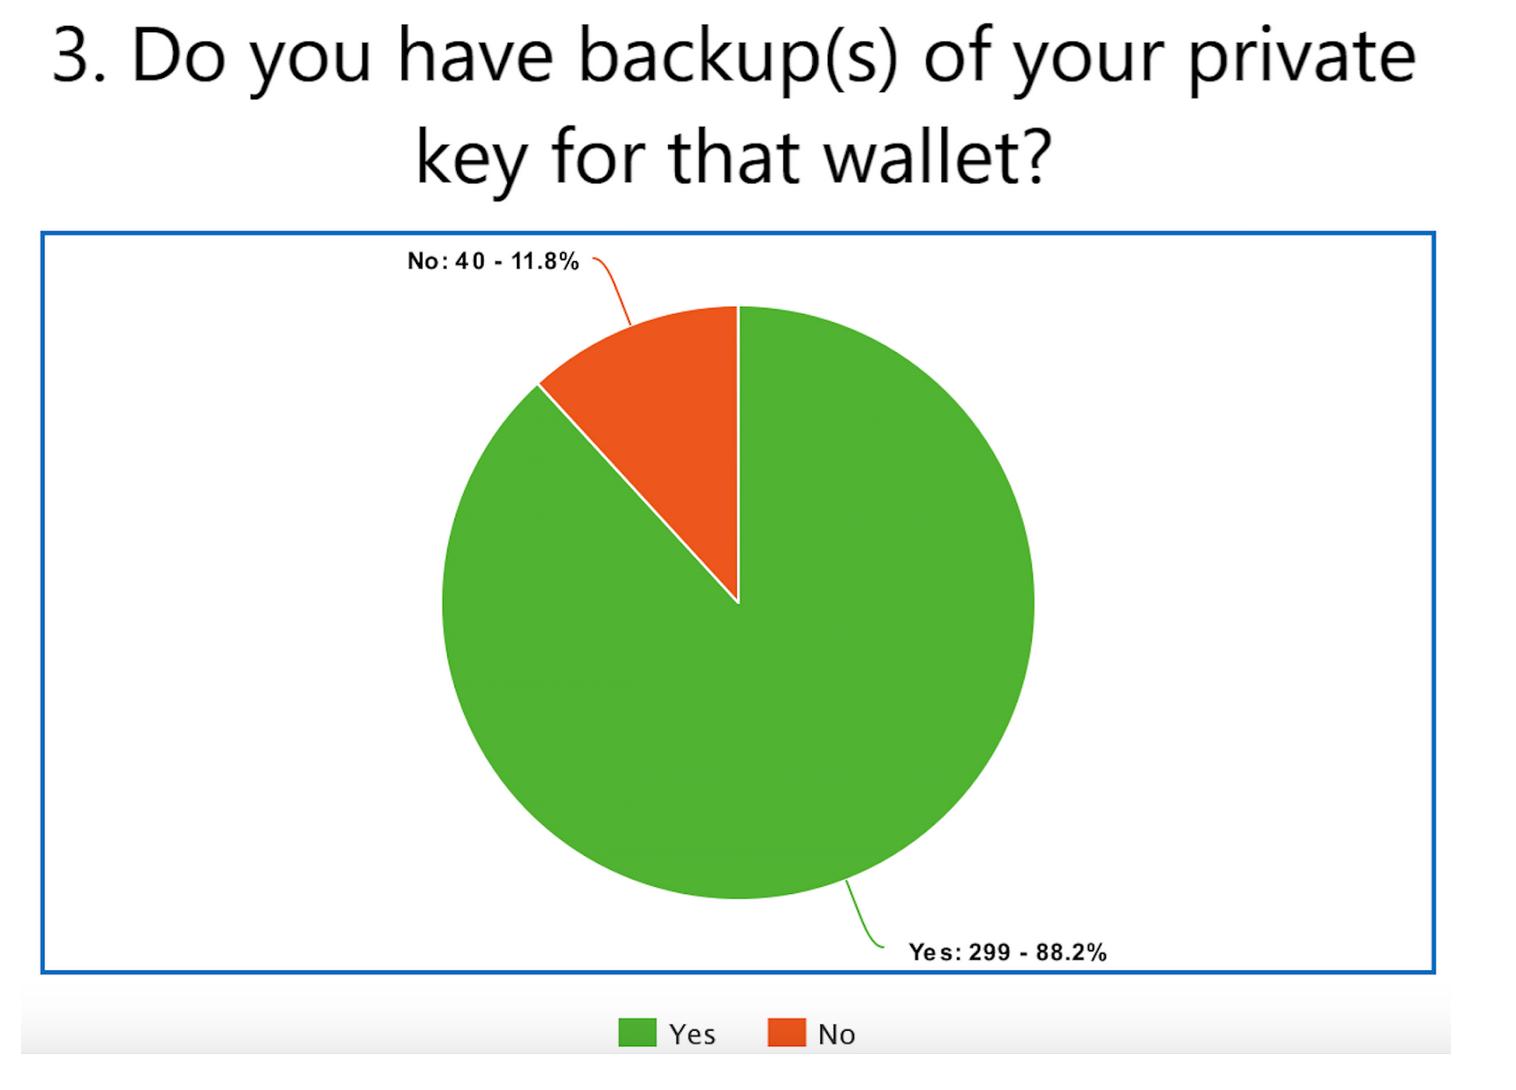 Survey Shows Many BTC Holders Use Hardware Wallet, Have Backup Keys